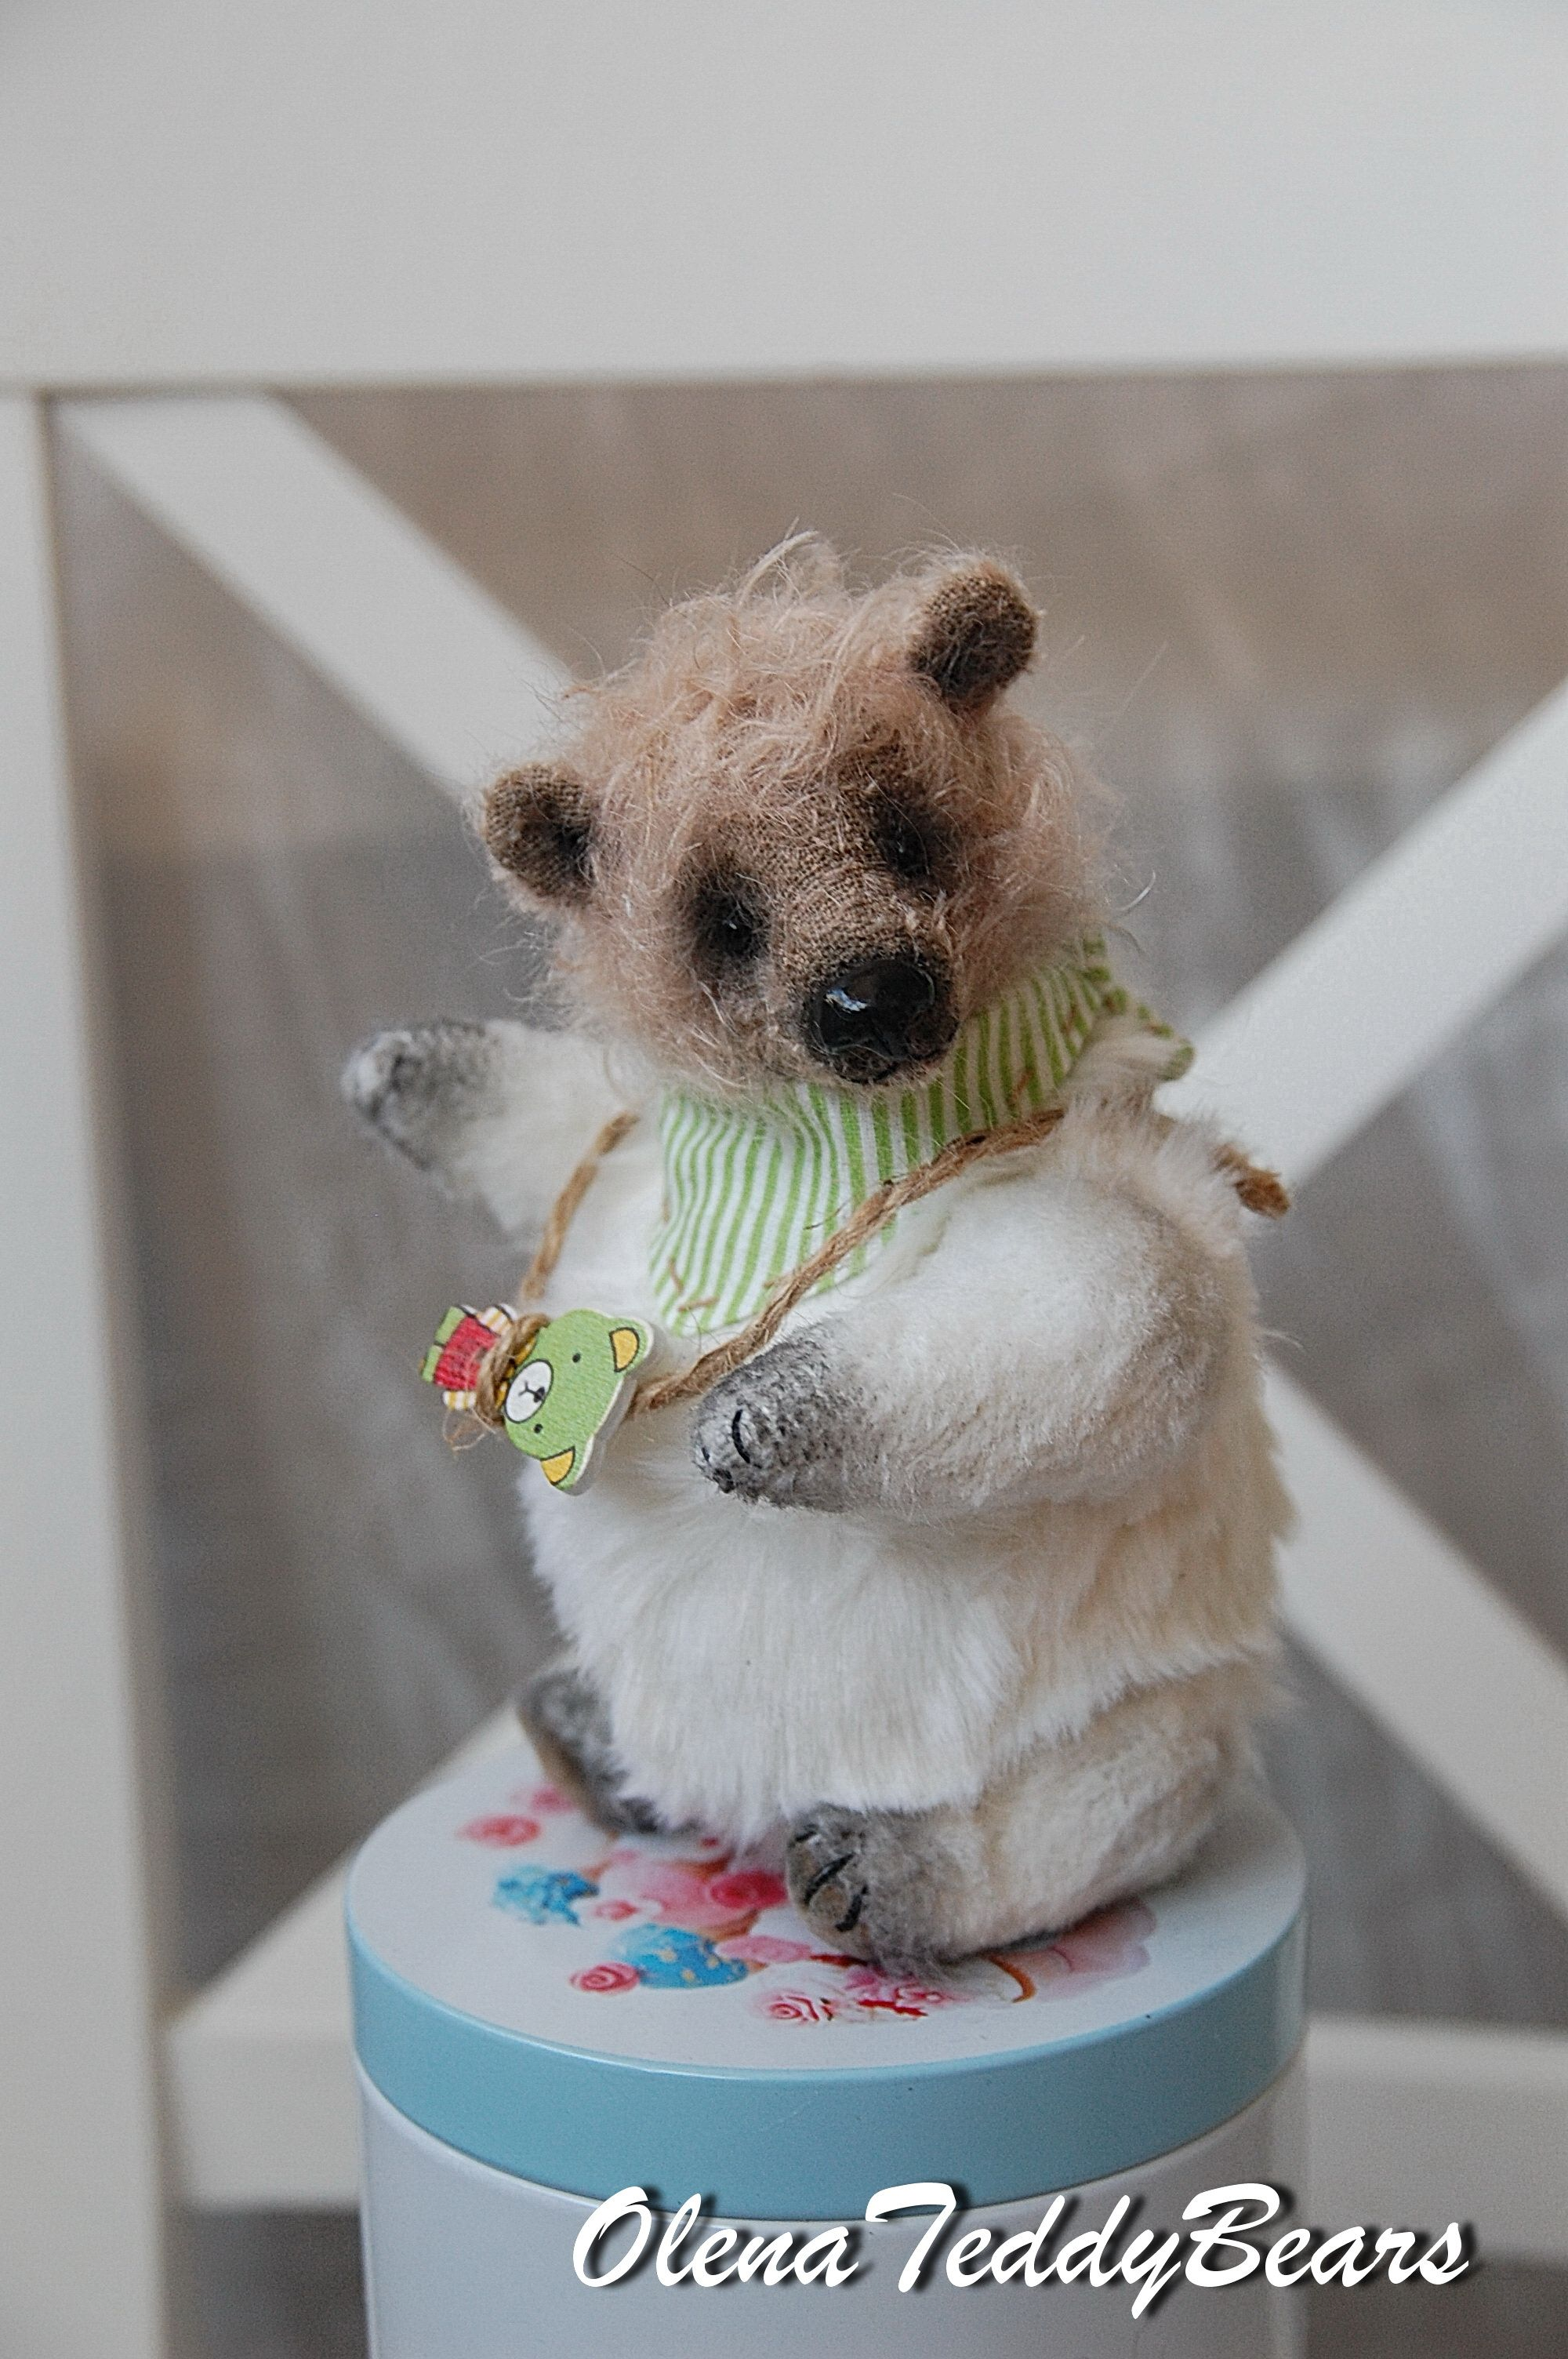 Teddy Bear Gift Ooak Teddy Bear Interior Toy Collectible Etsy Teddy Bear Gifts Bear Stuffed Animal Handmade Stuffed Animals [ 3008 x 2000 Pixel ]